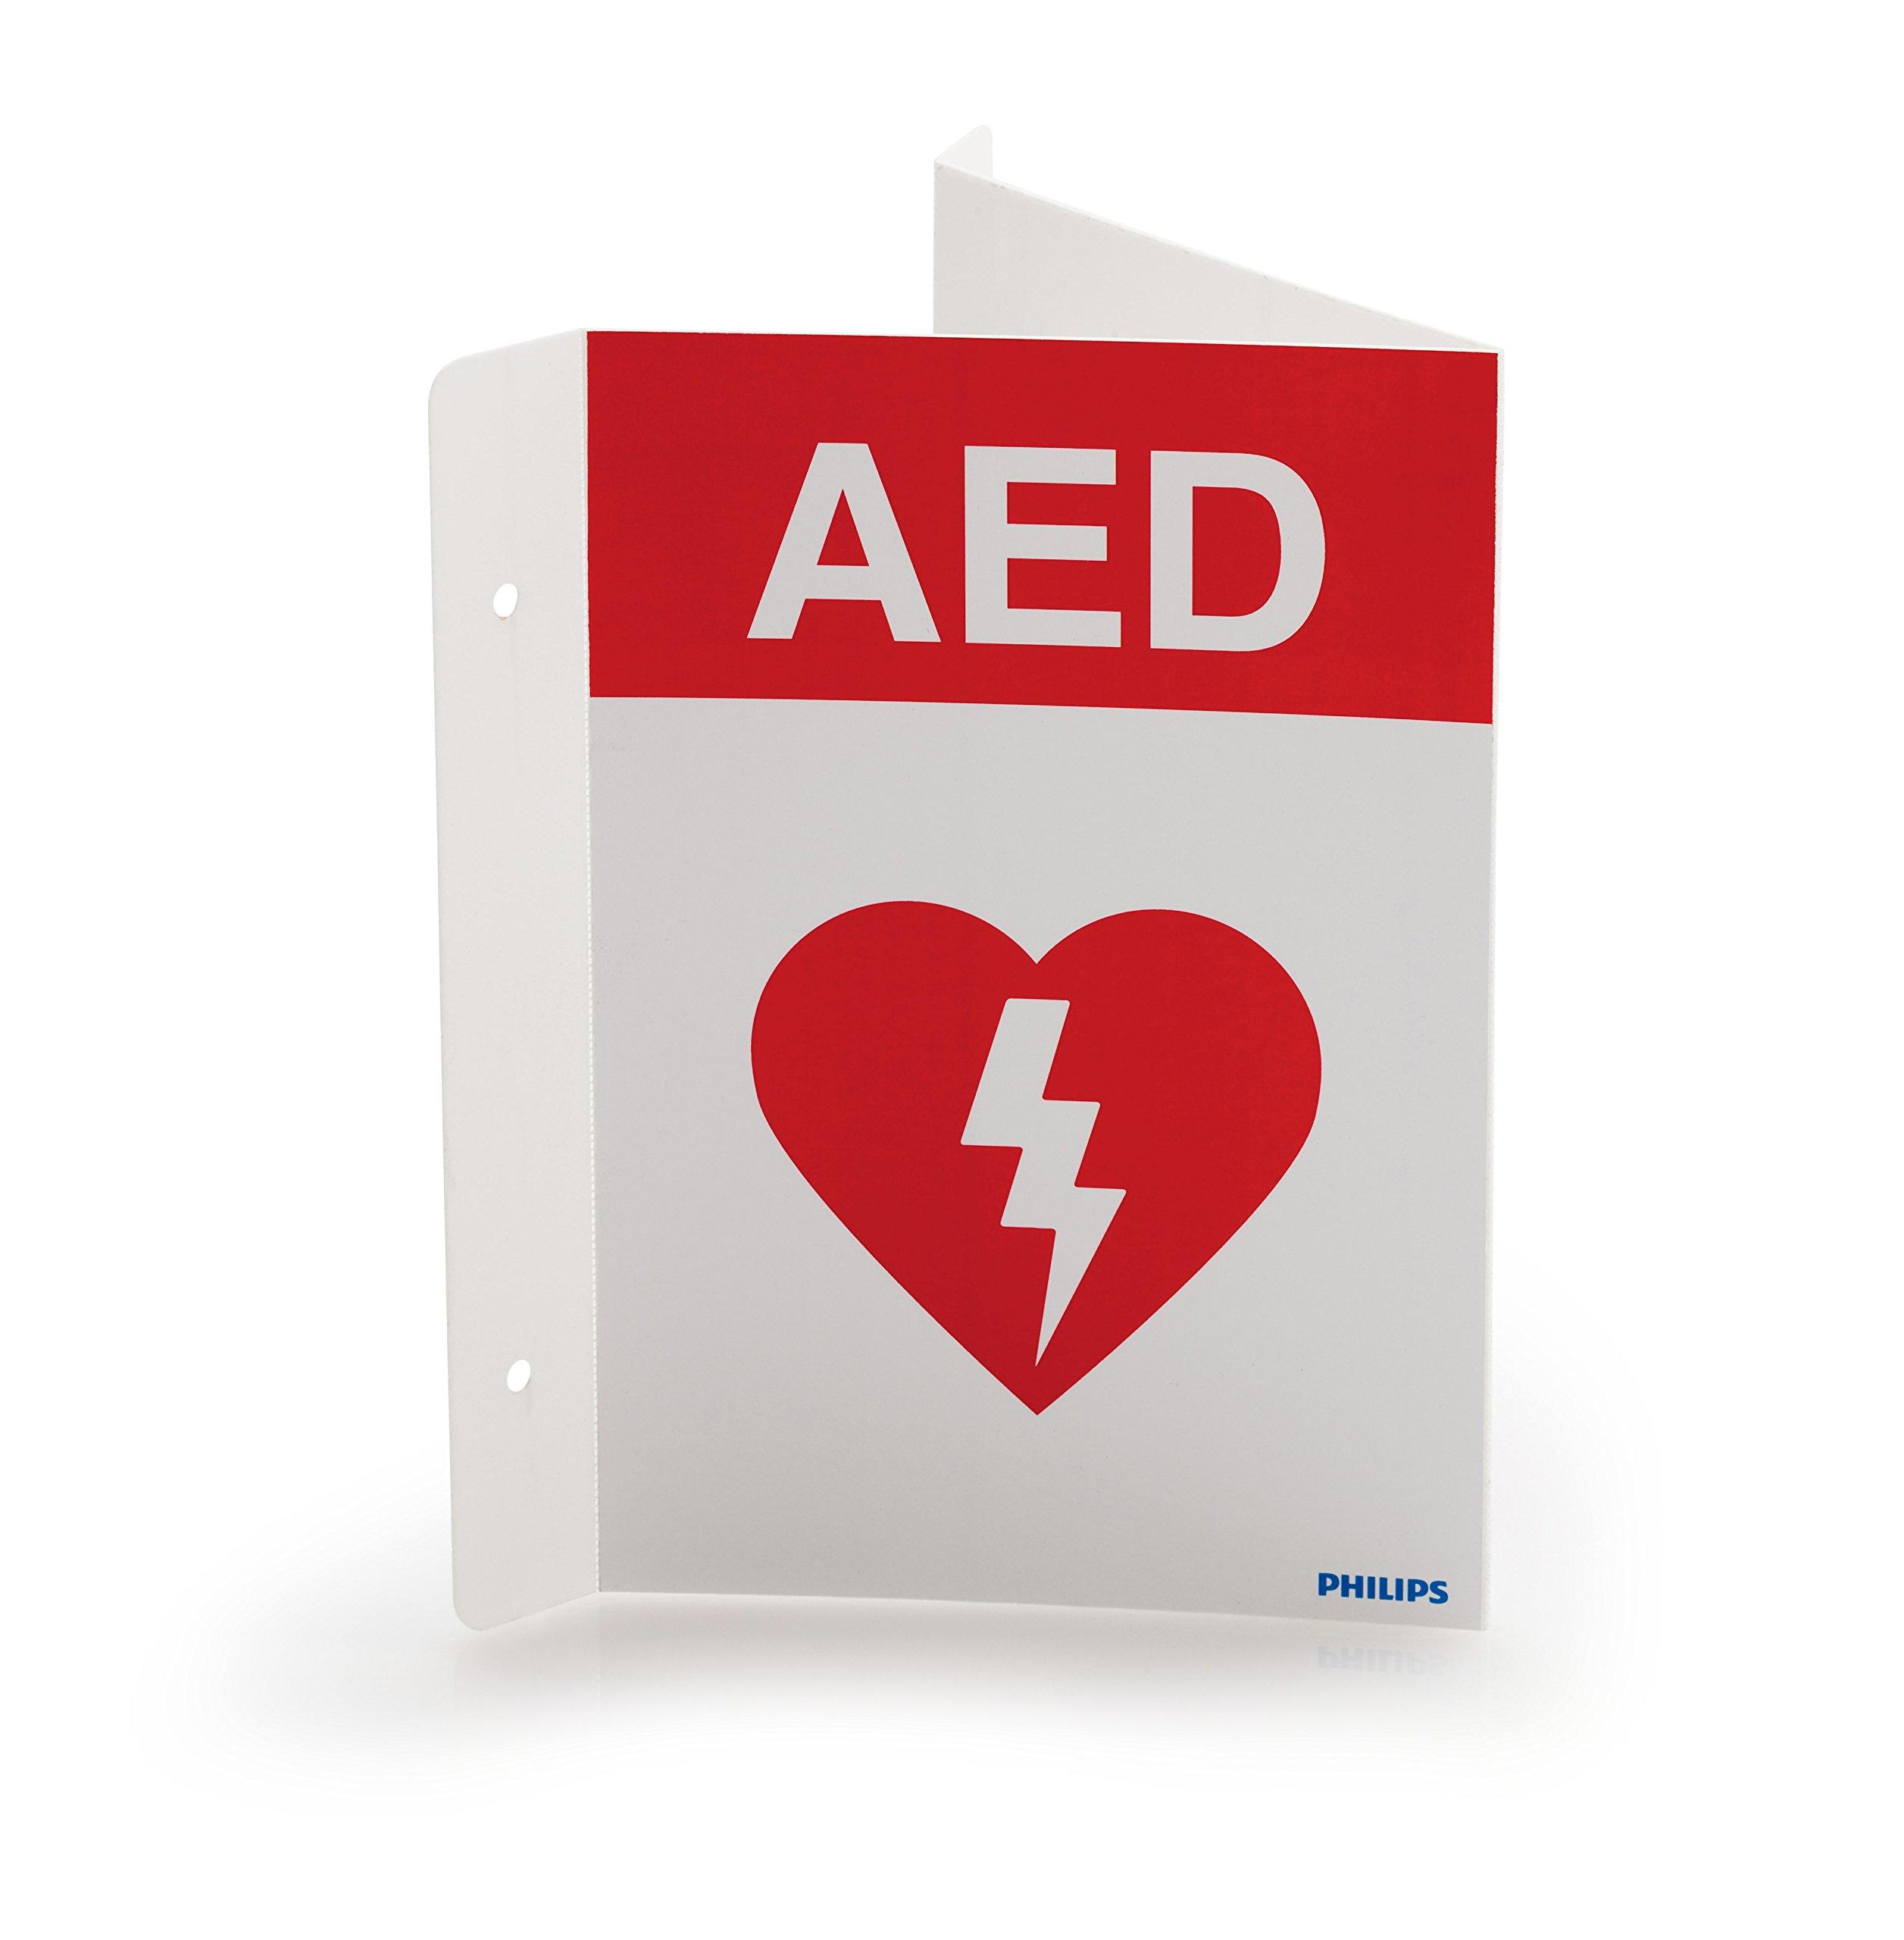 Philips HeartStart 989803170921 AED Wall Sign